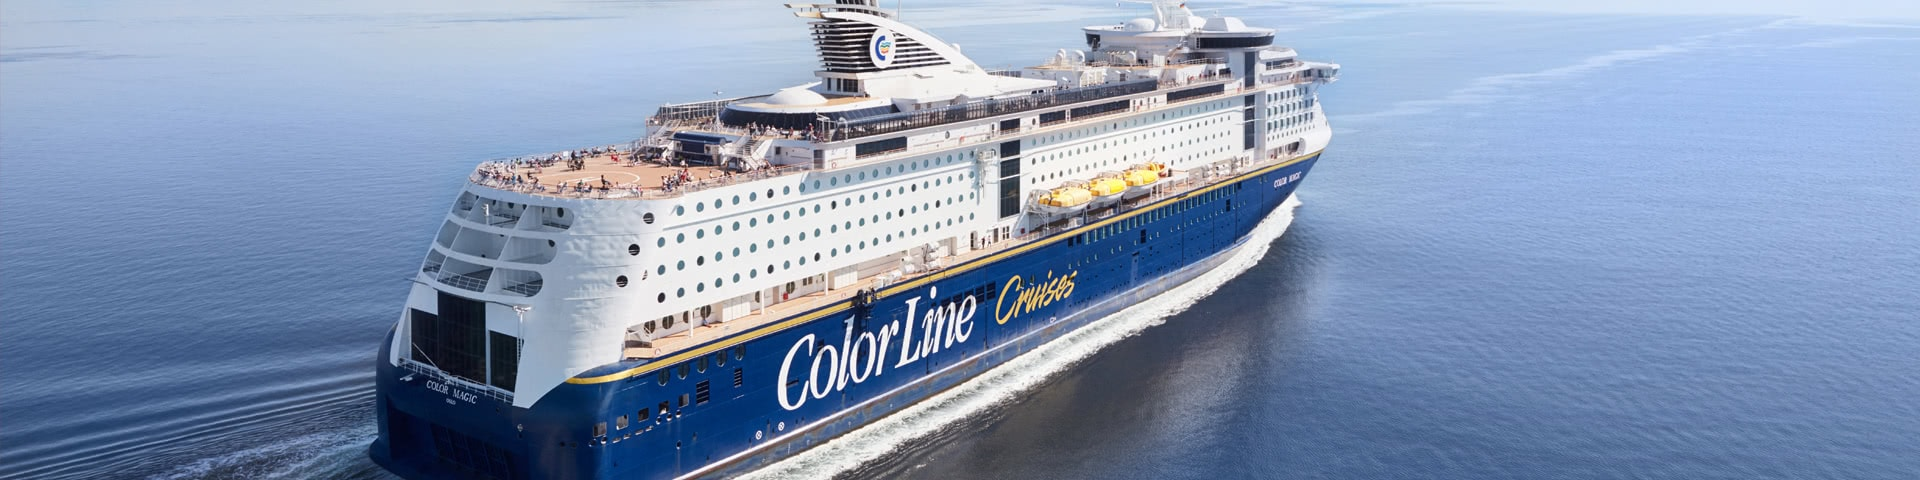 Color-Line-Schiff auf dem Meer